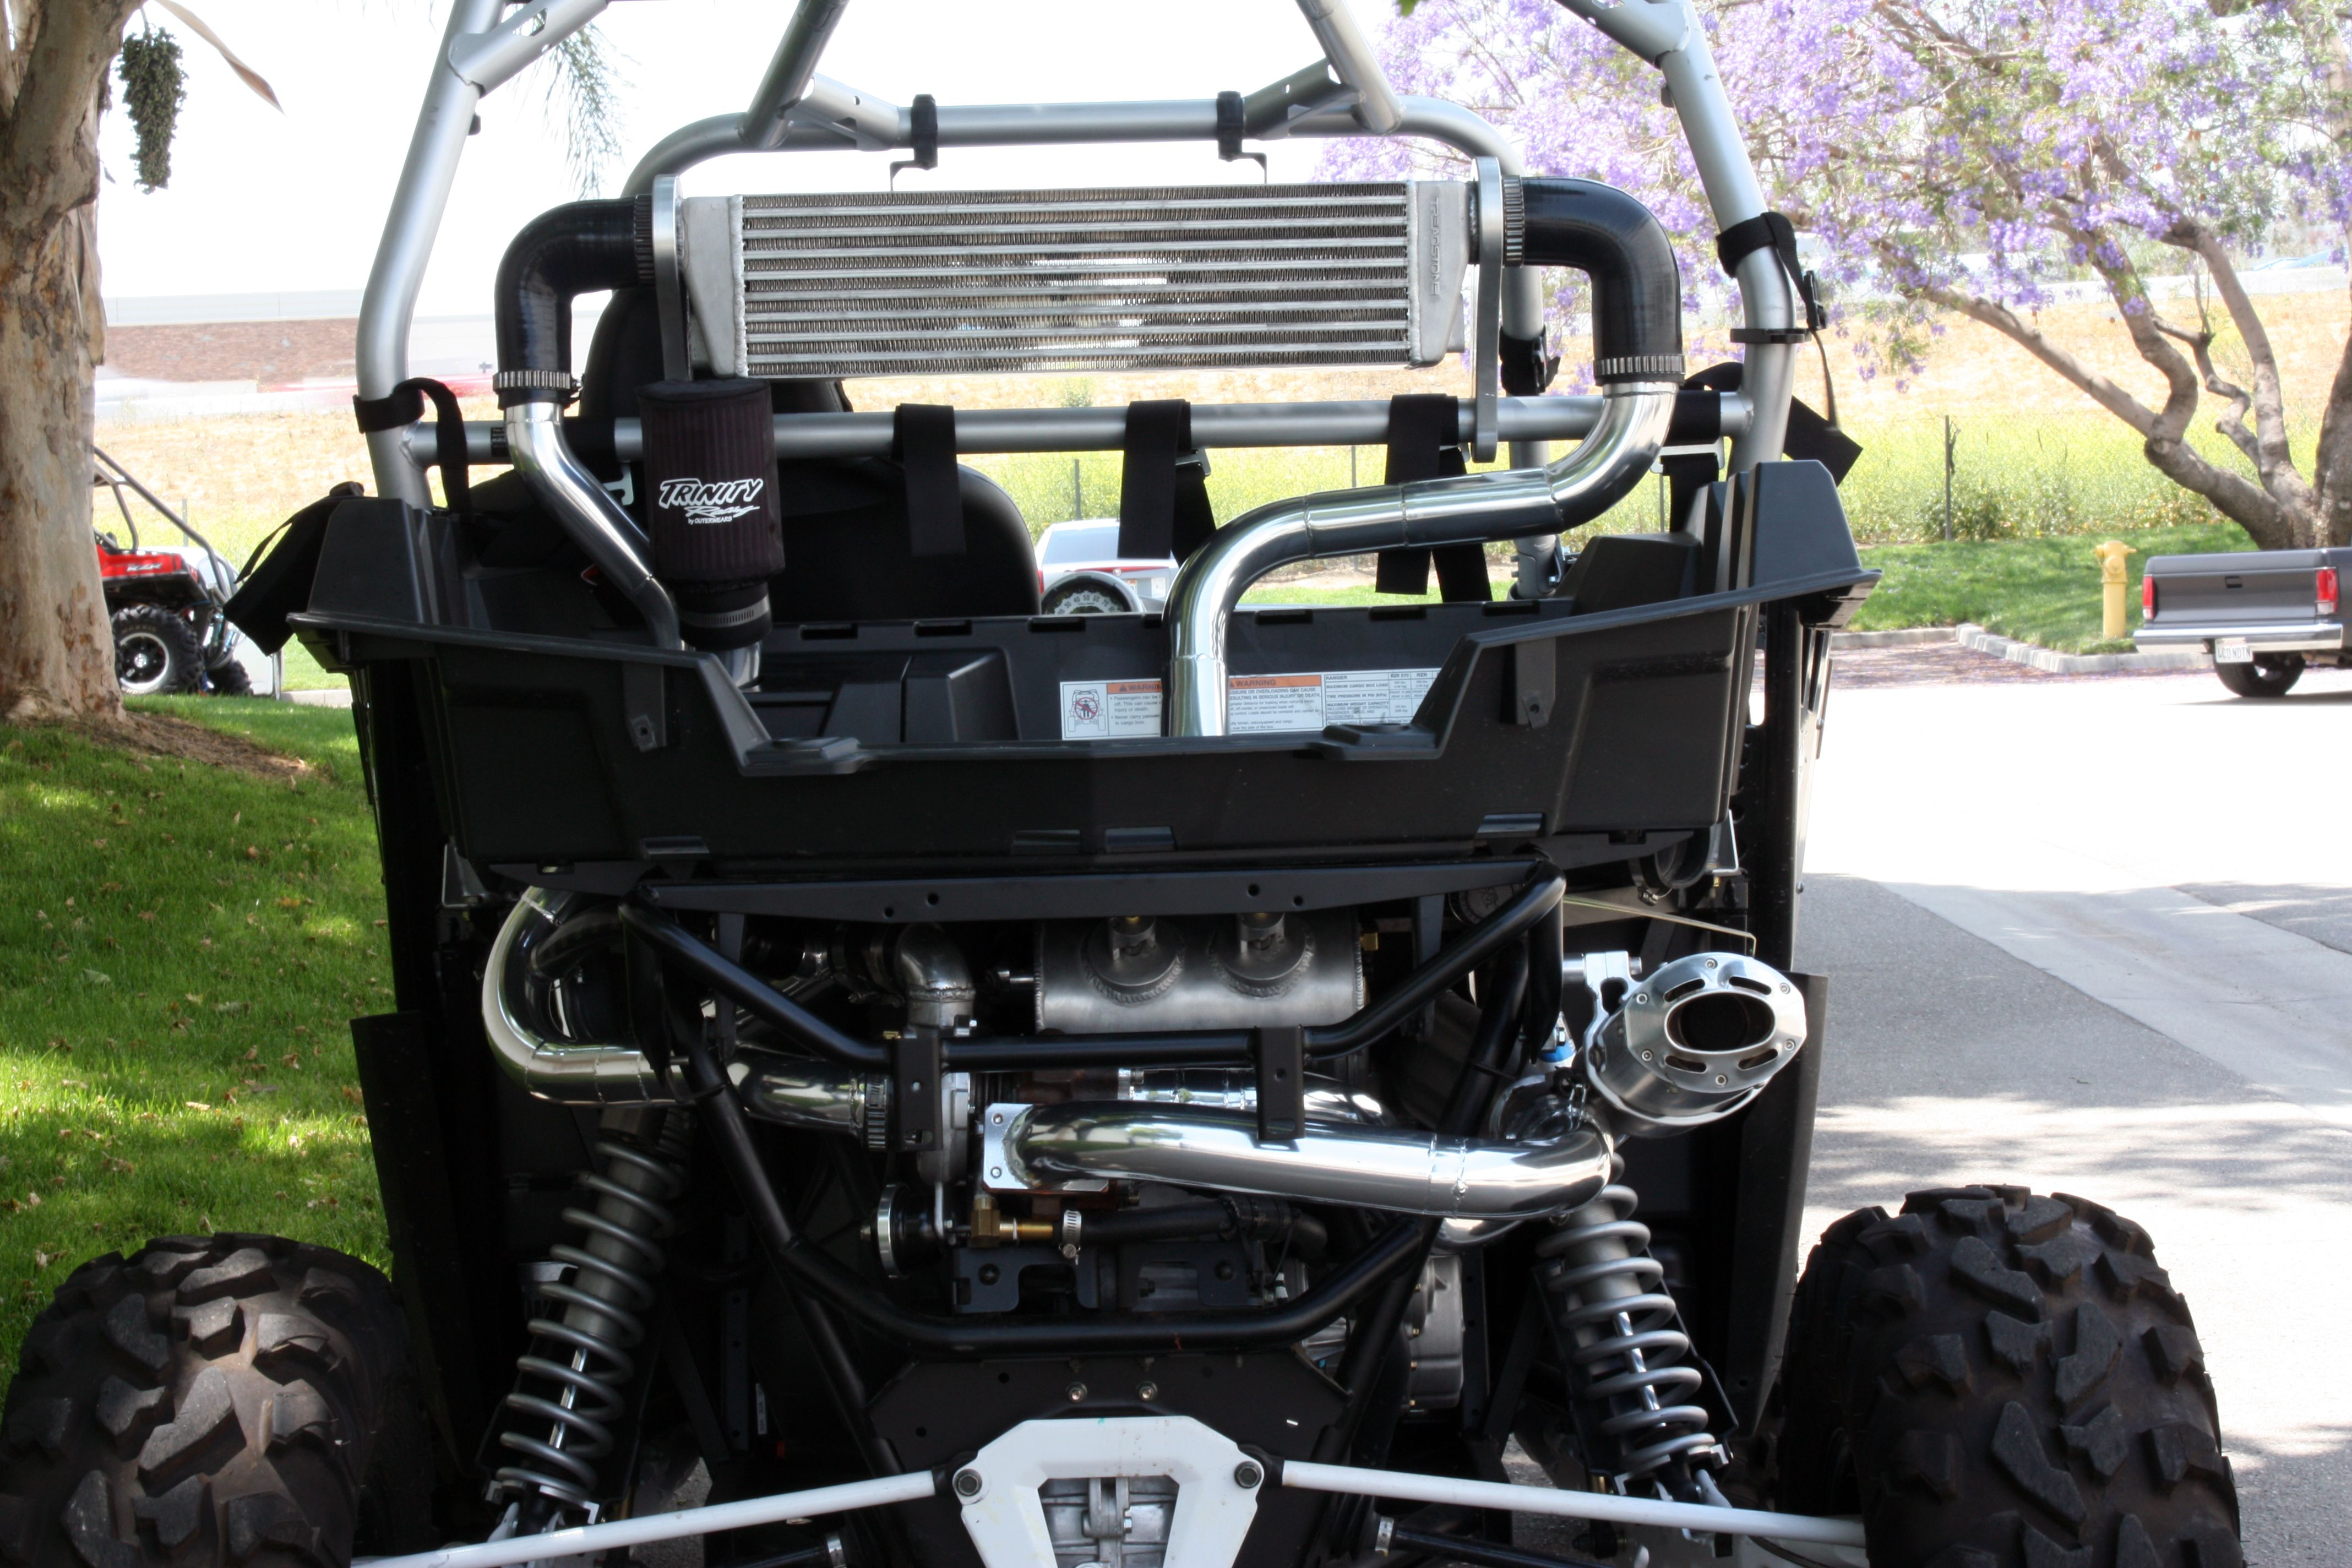 Trinity Turbo Kit RZR XP 900 10PSI with no vehicle body